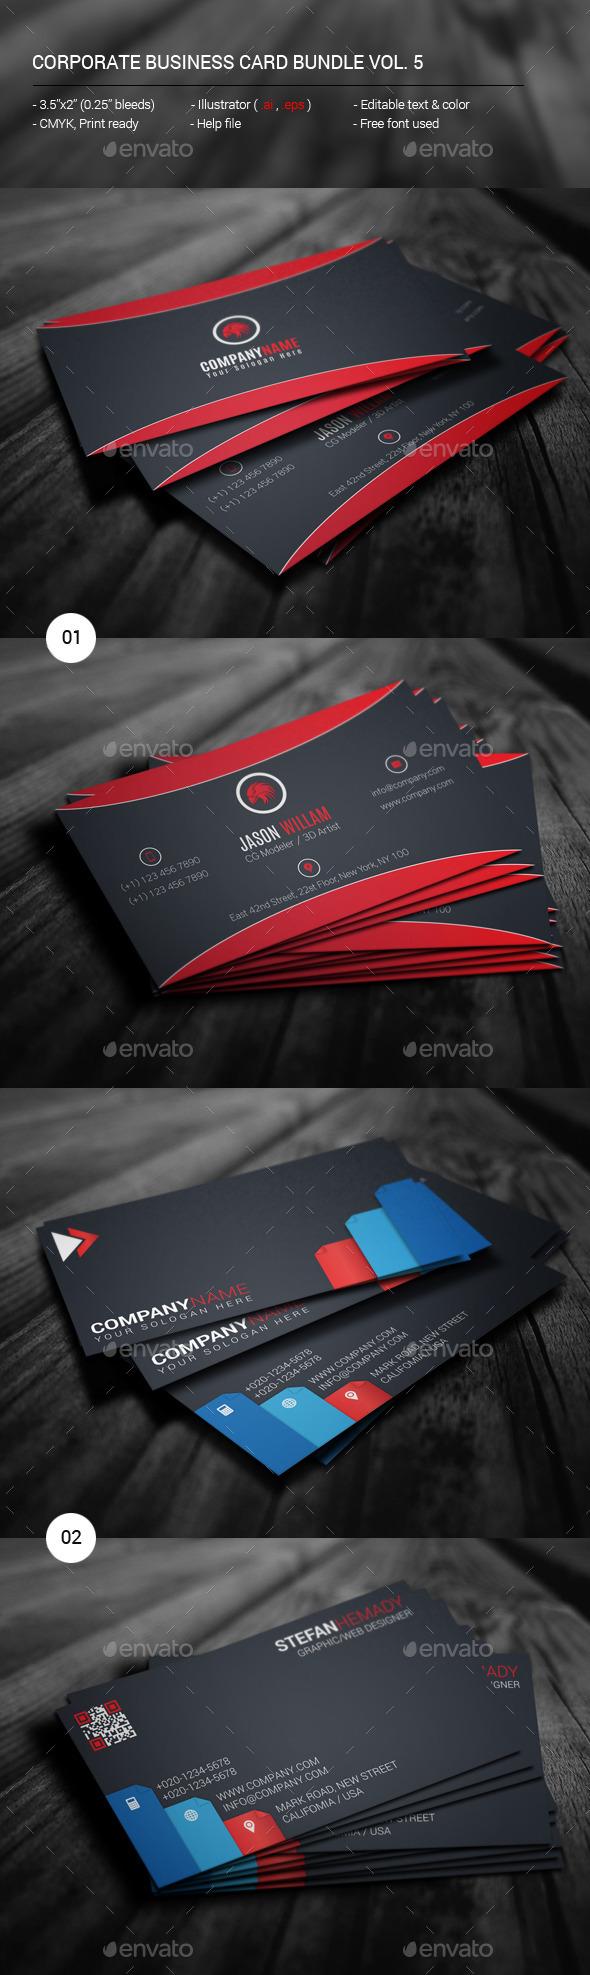 GraphicRiver Corporate Business Card Bundle Vol 5 11795478